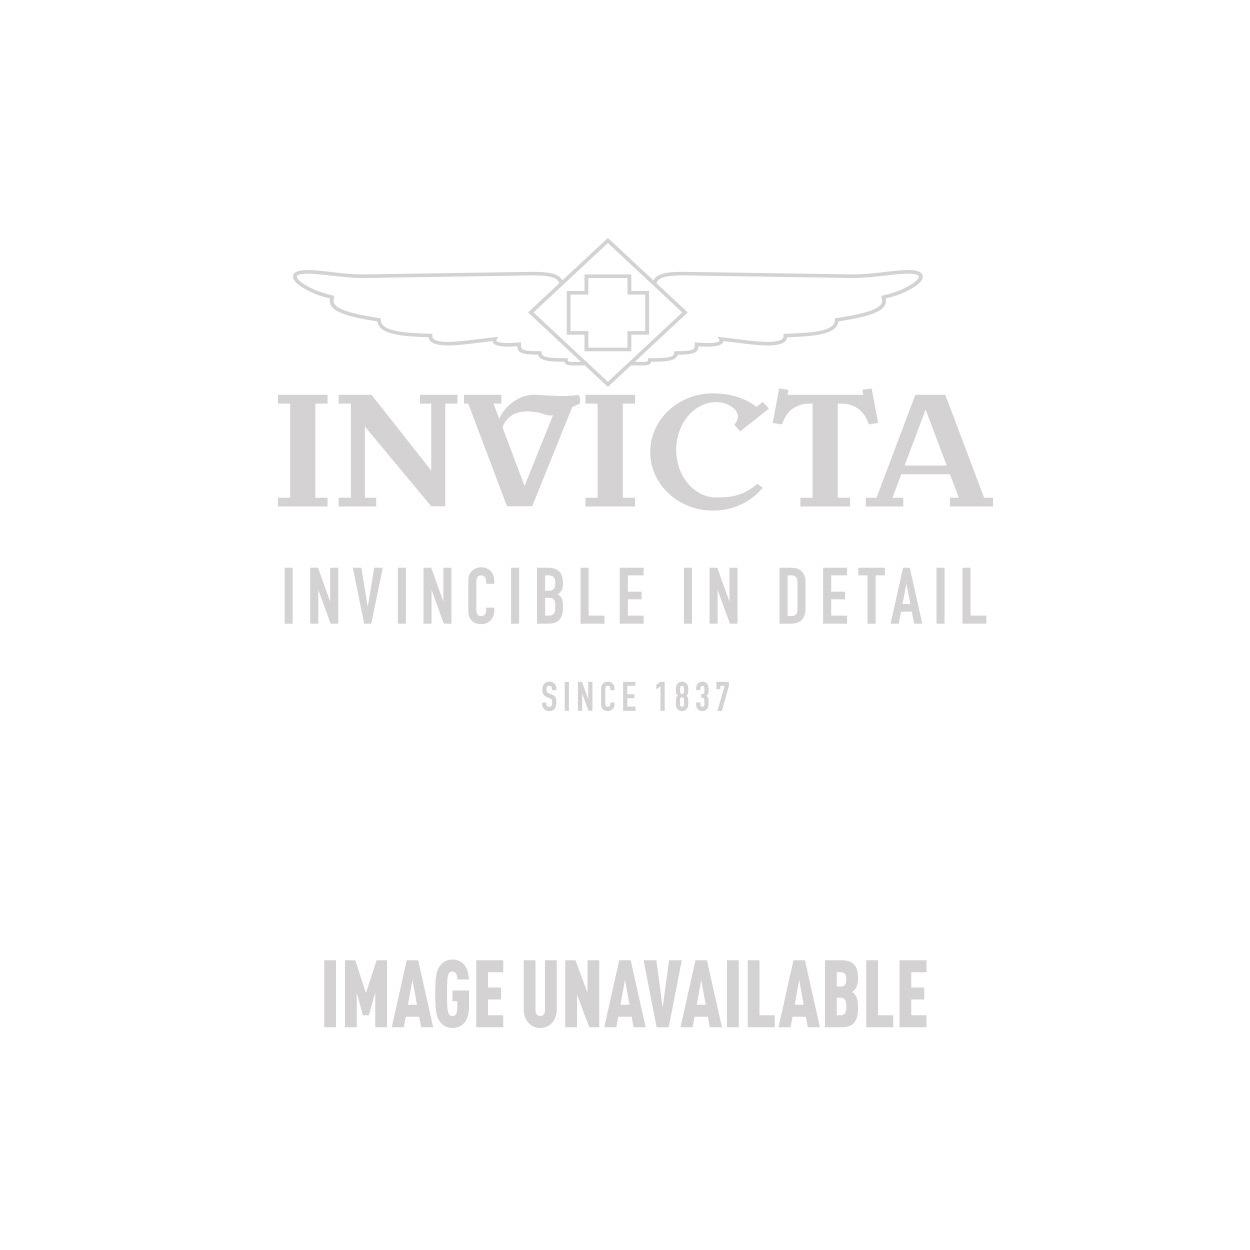 Invicta Venom Watch In Black Stainless Steel At